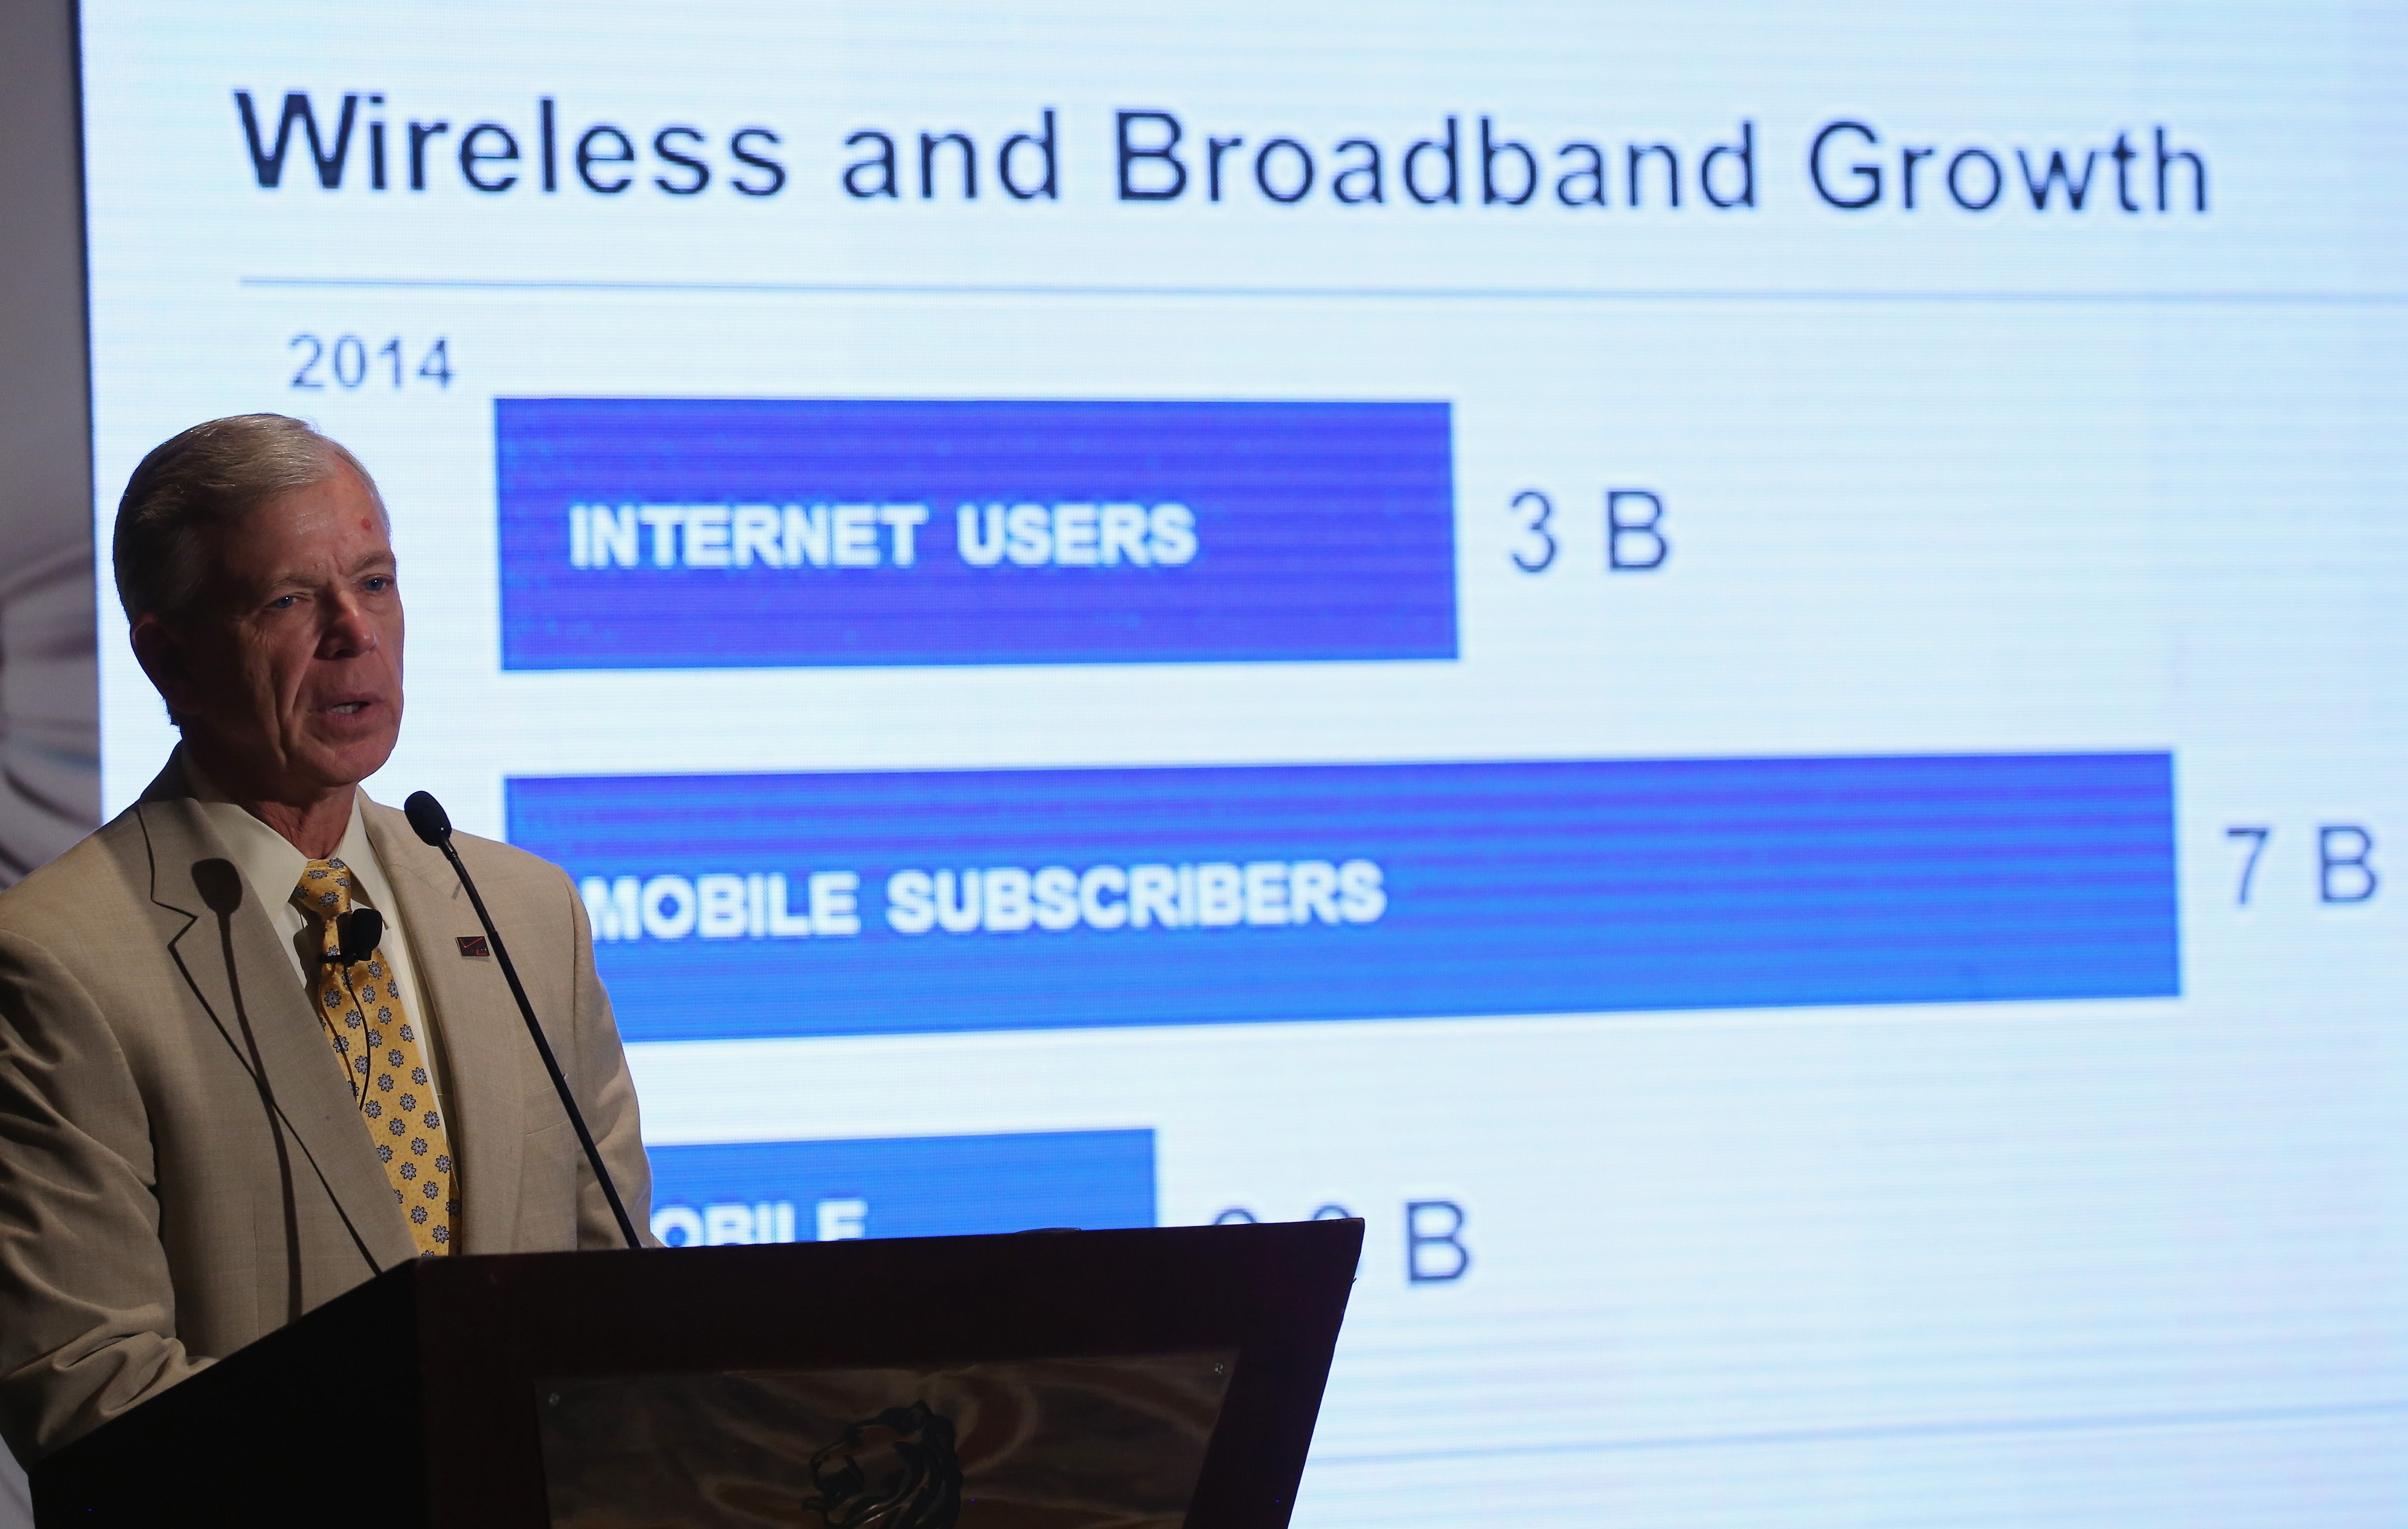 Verizon CEO Lowell McAdam Speaks Conference In Arlington, Virginia